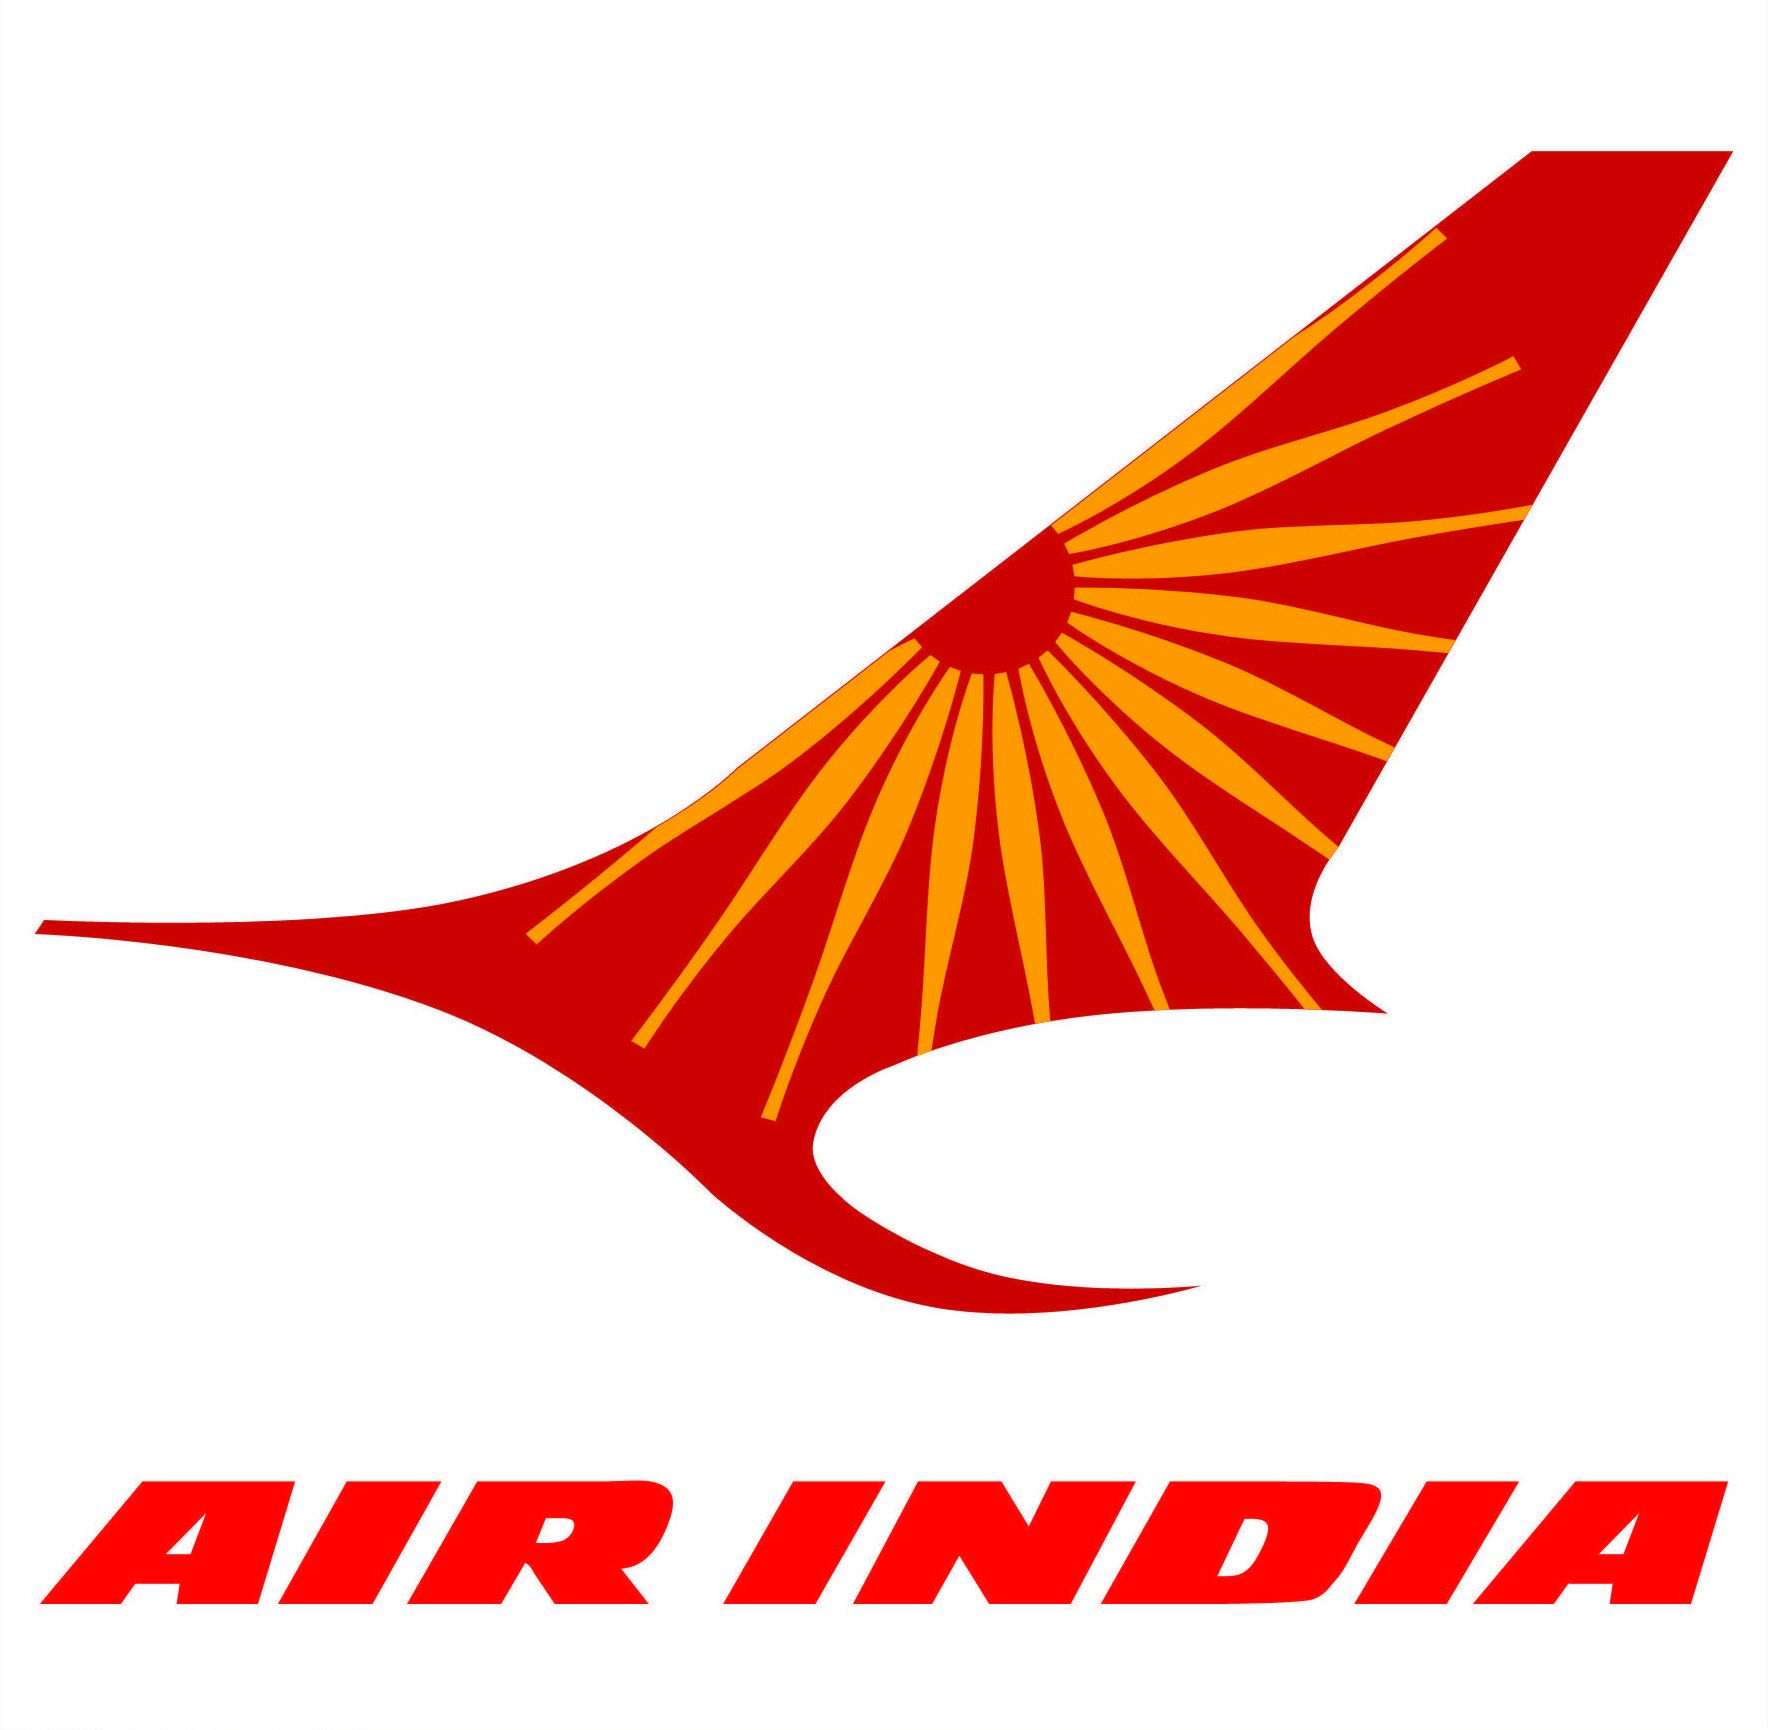 Air India logo INDIA Air india, Airline logo, India logo